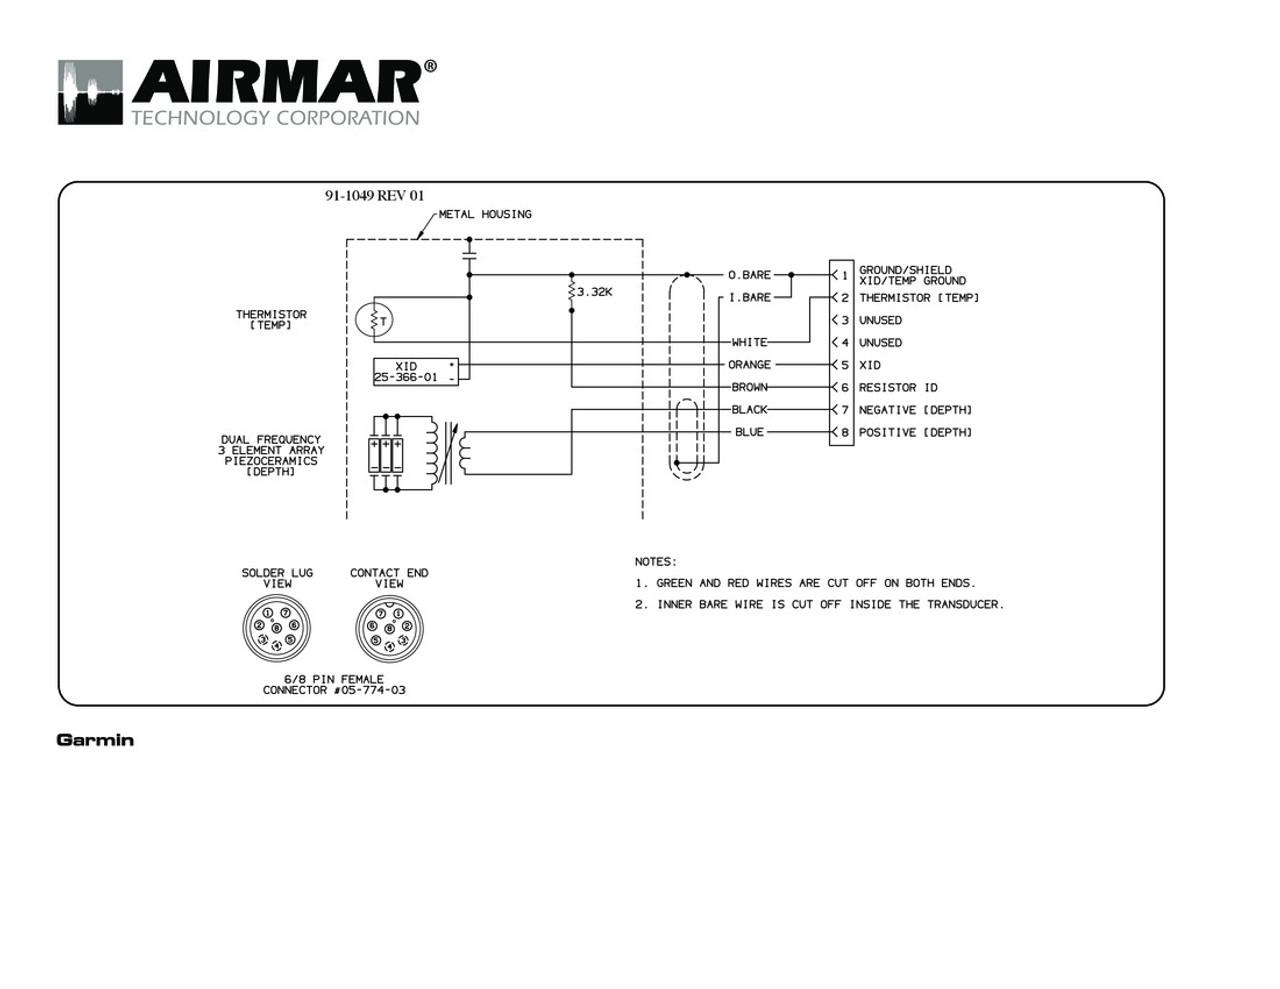 Garmin 232 Wiring Diagram - Wiring Diagrams Hidden on